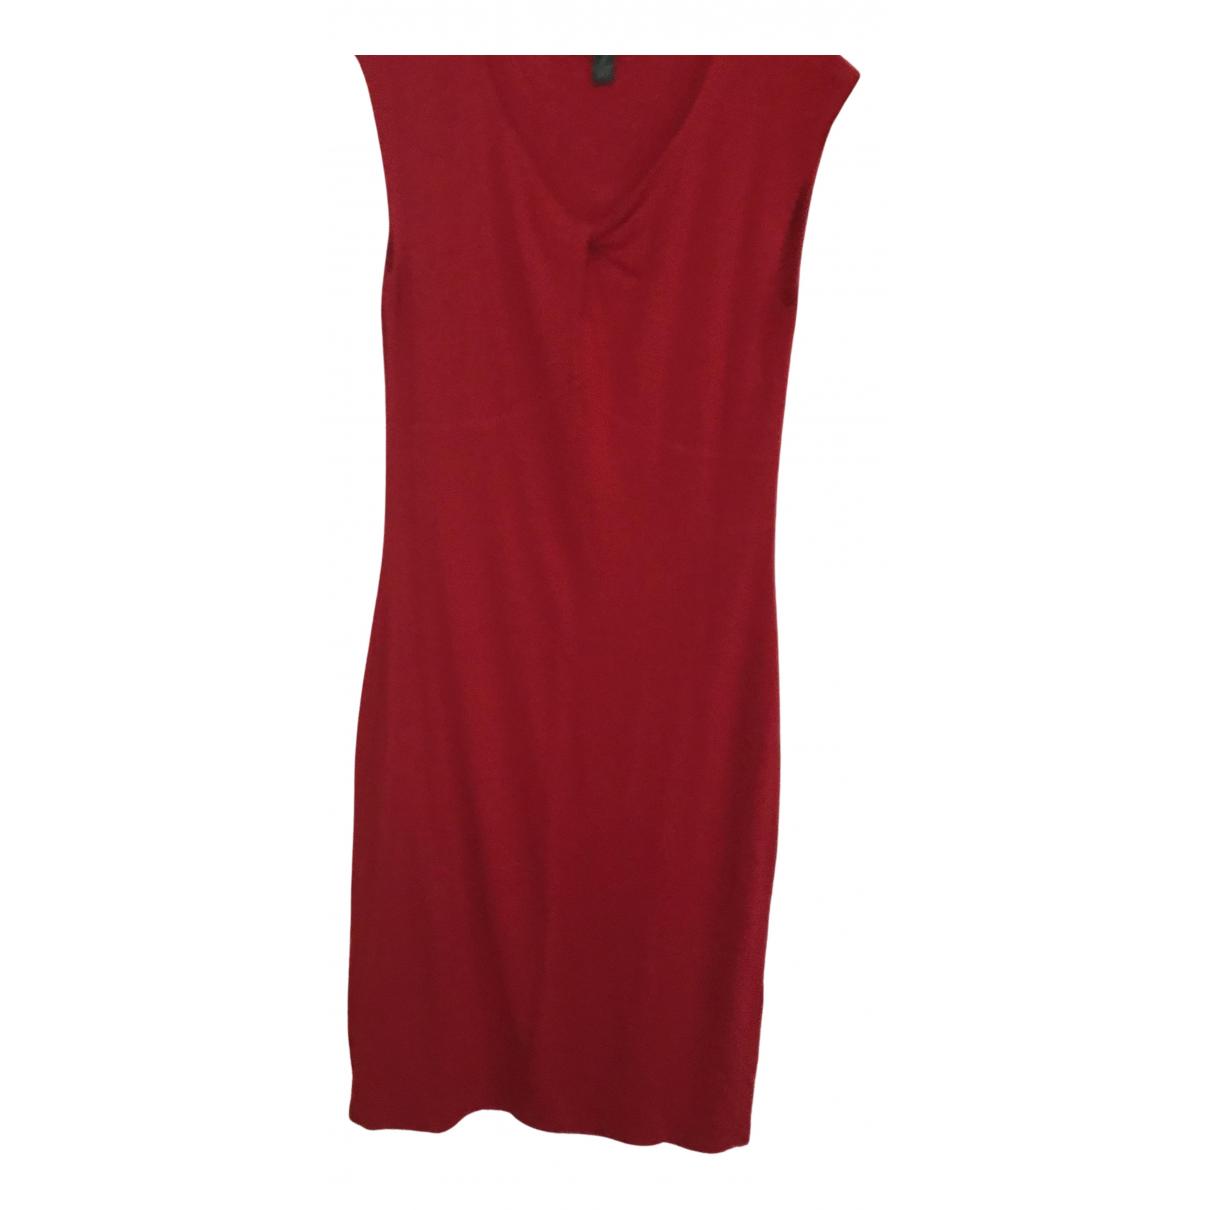 Lauren Ralph Lauren \N Red dress for Women M International